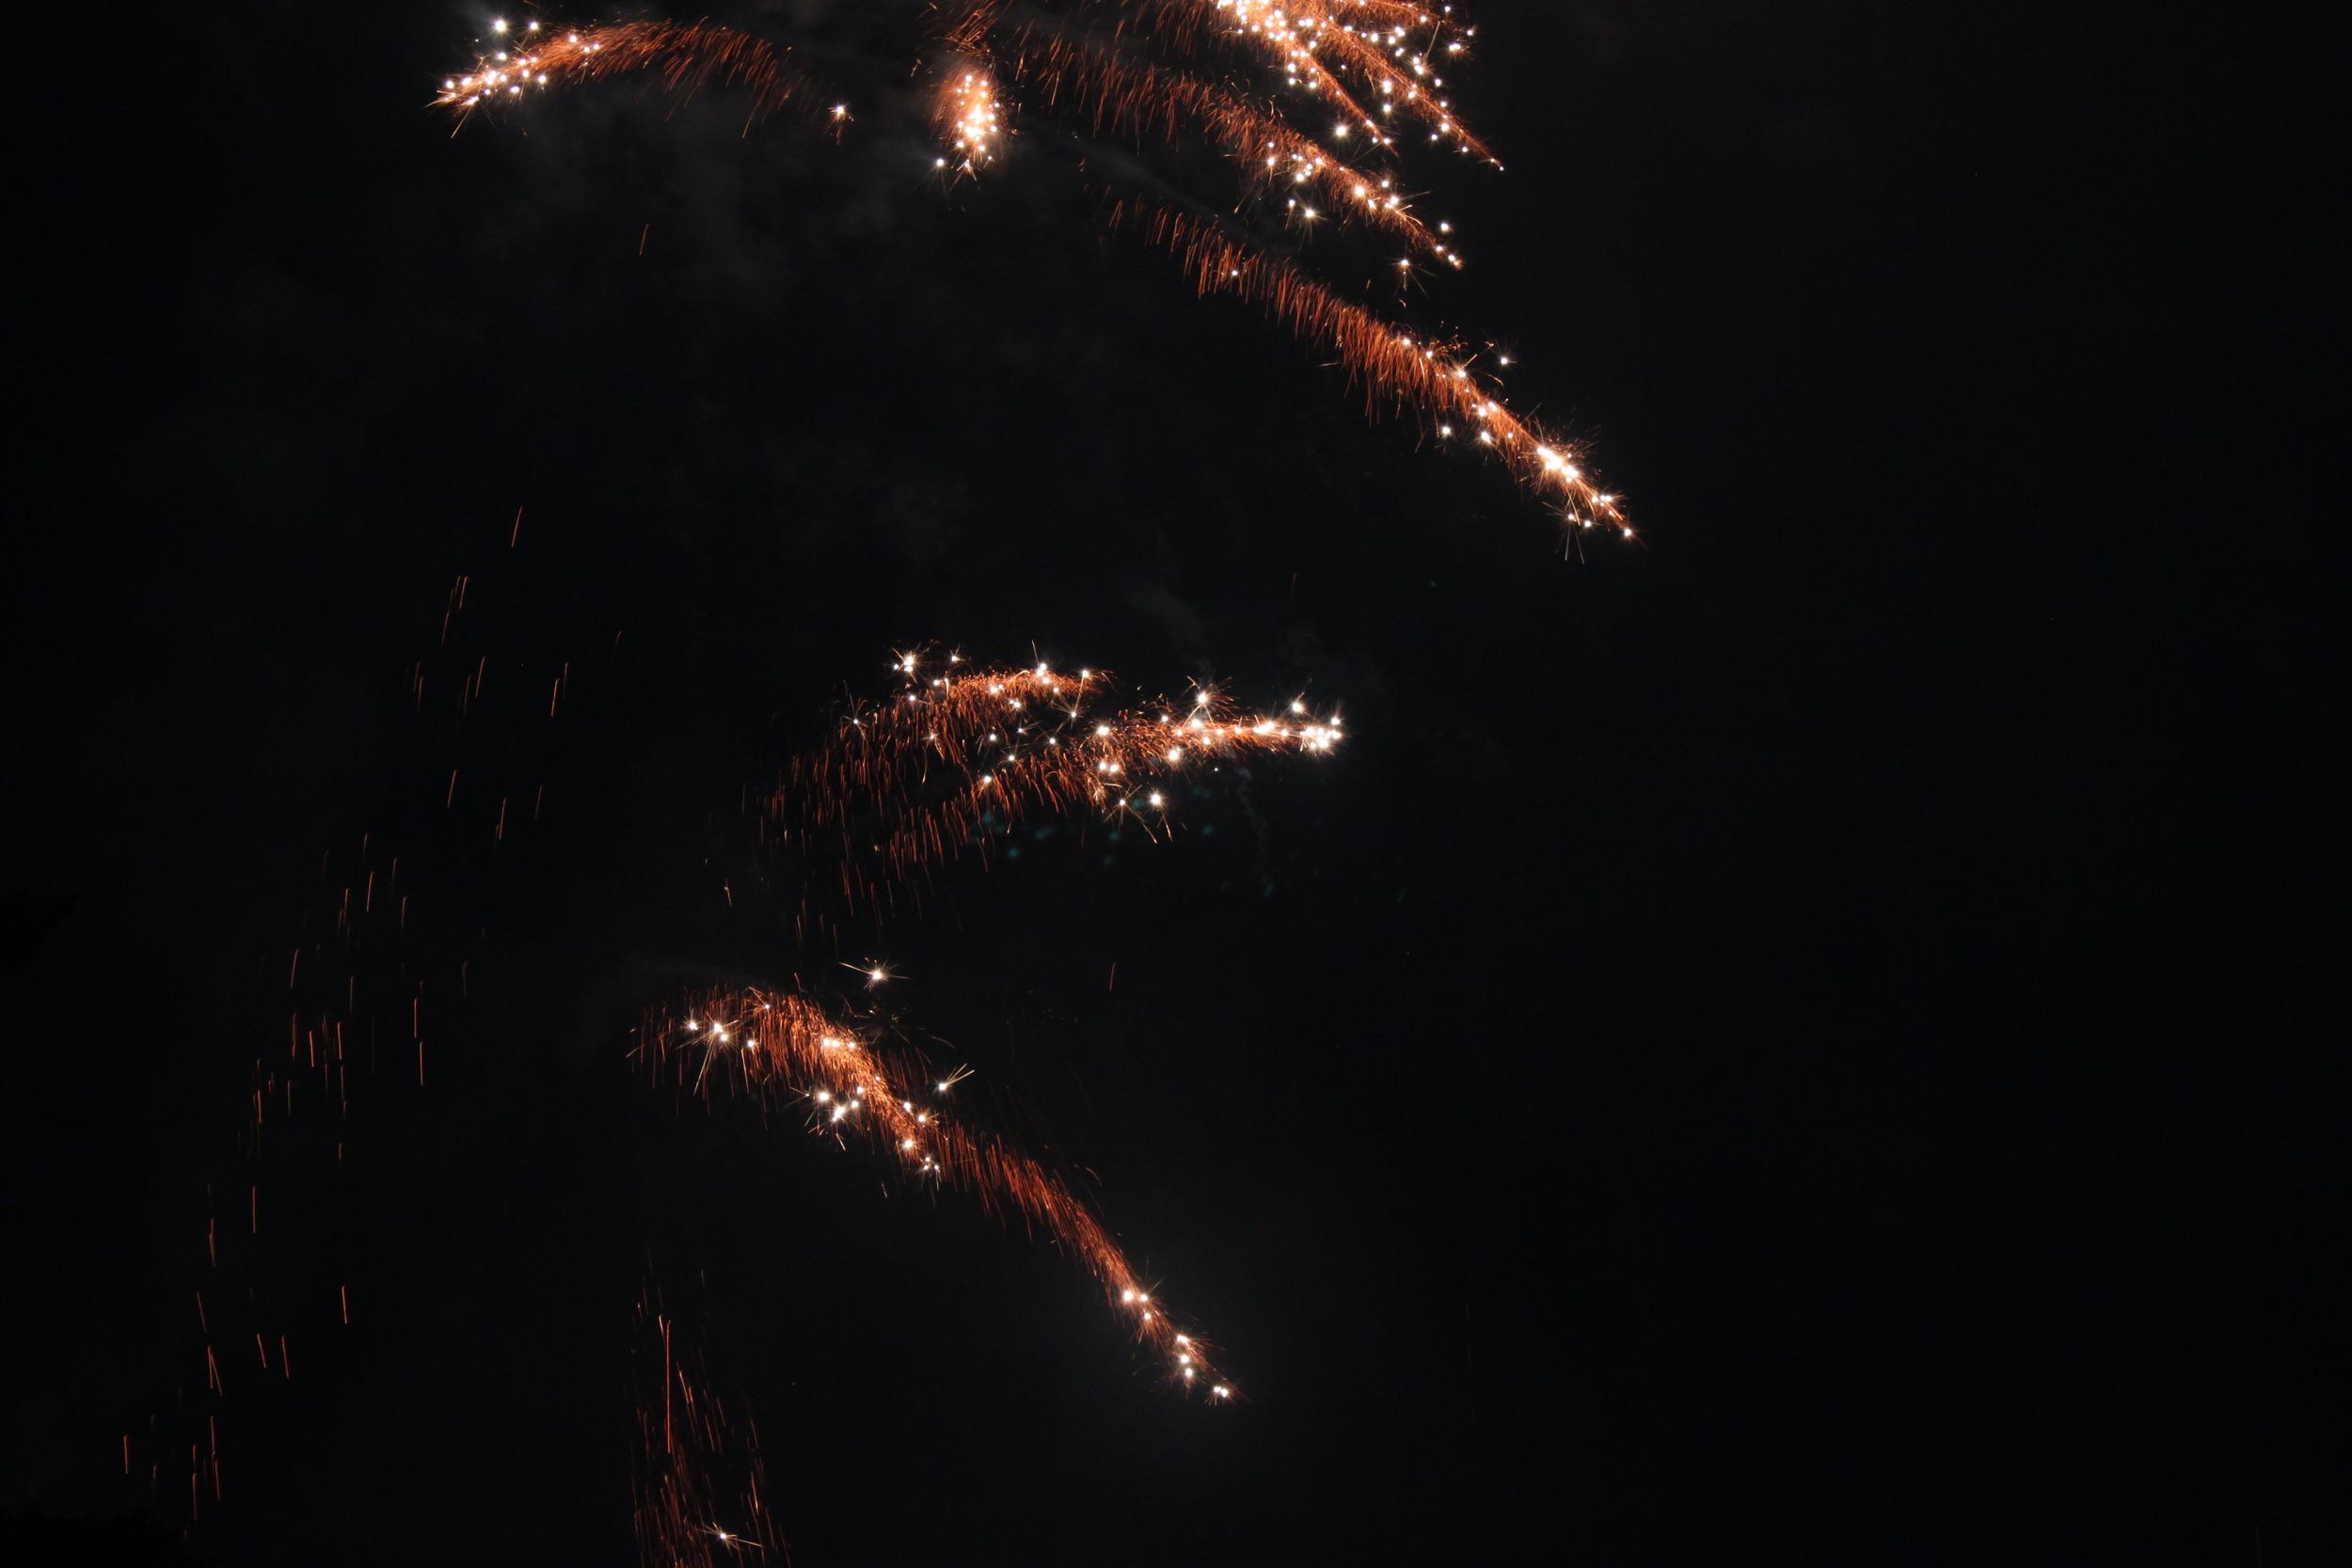 Fireworks by Danae Moore